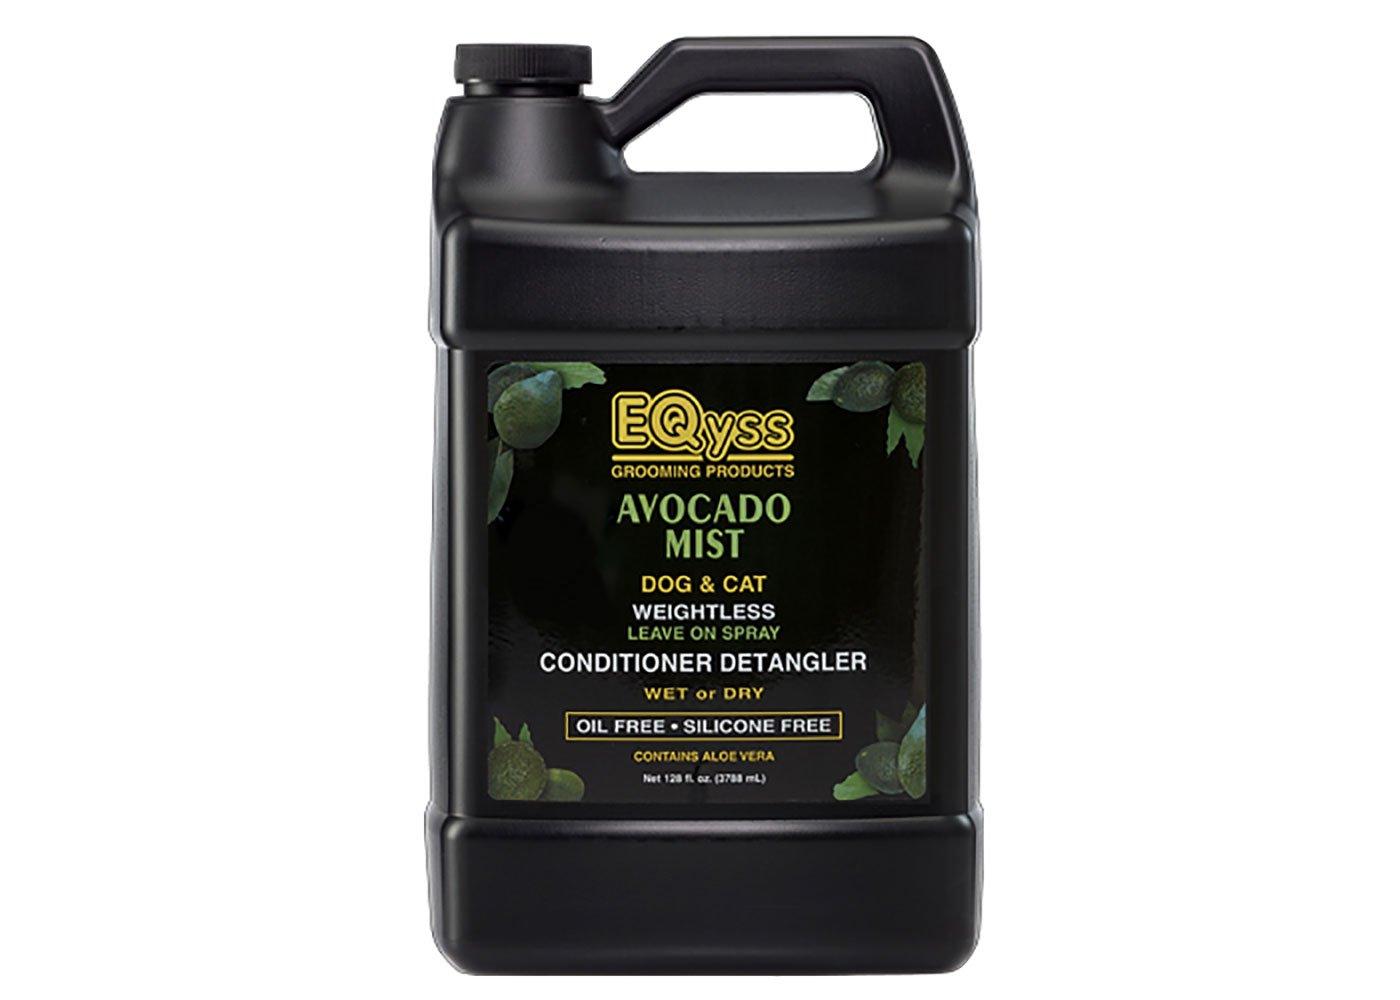 EQyss Avocado Mist Pet Conditioner Spray 128 oz